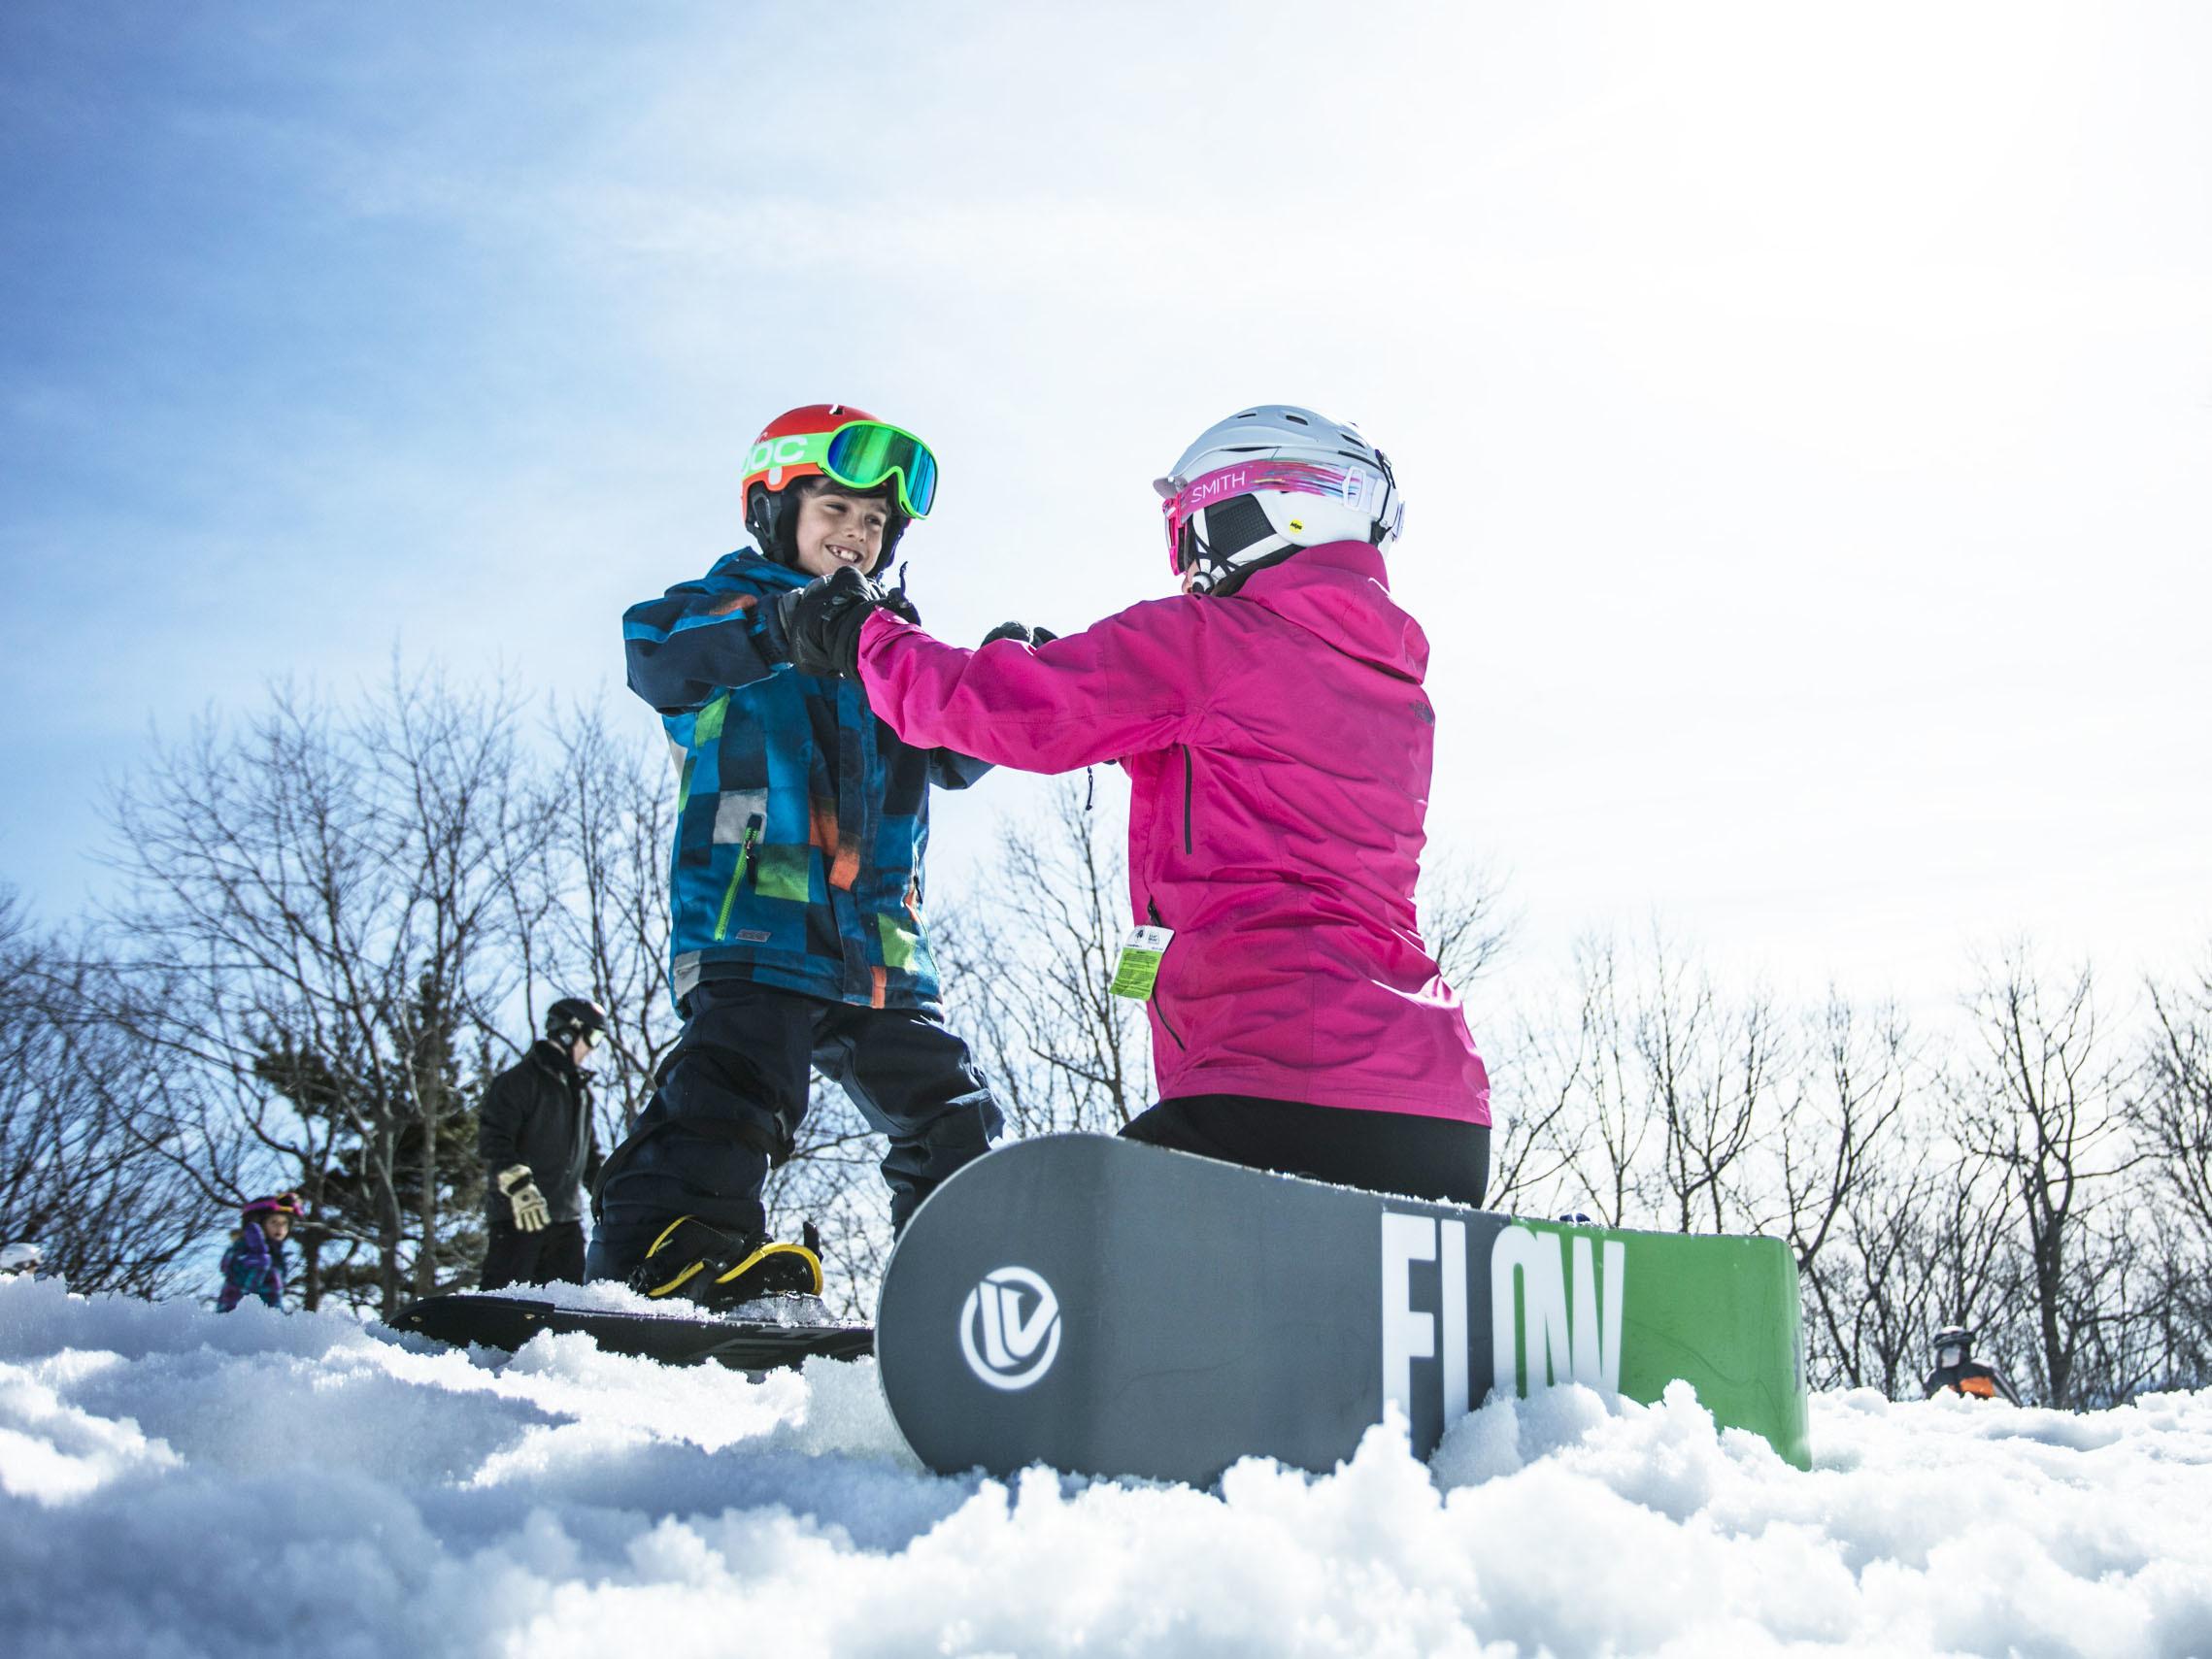 Ski Saint-Bruno, snowboarding, family